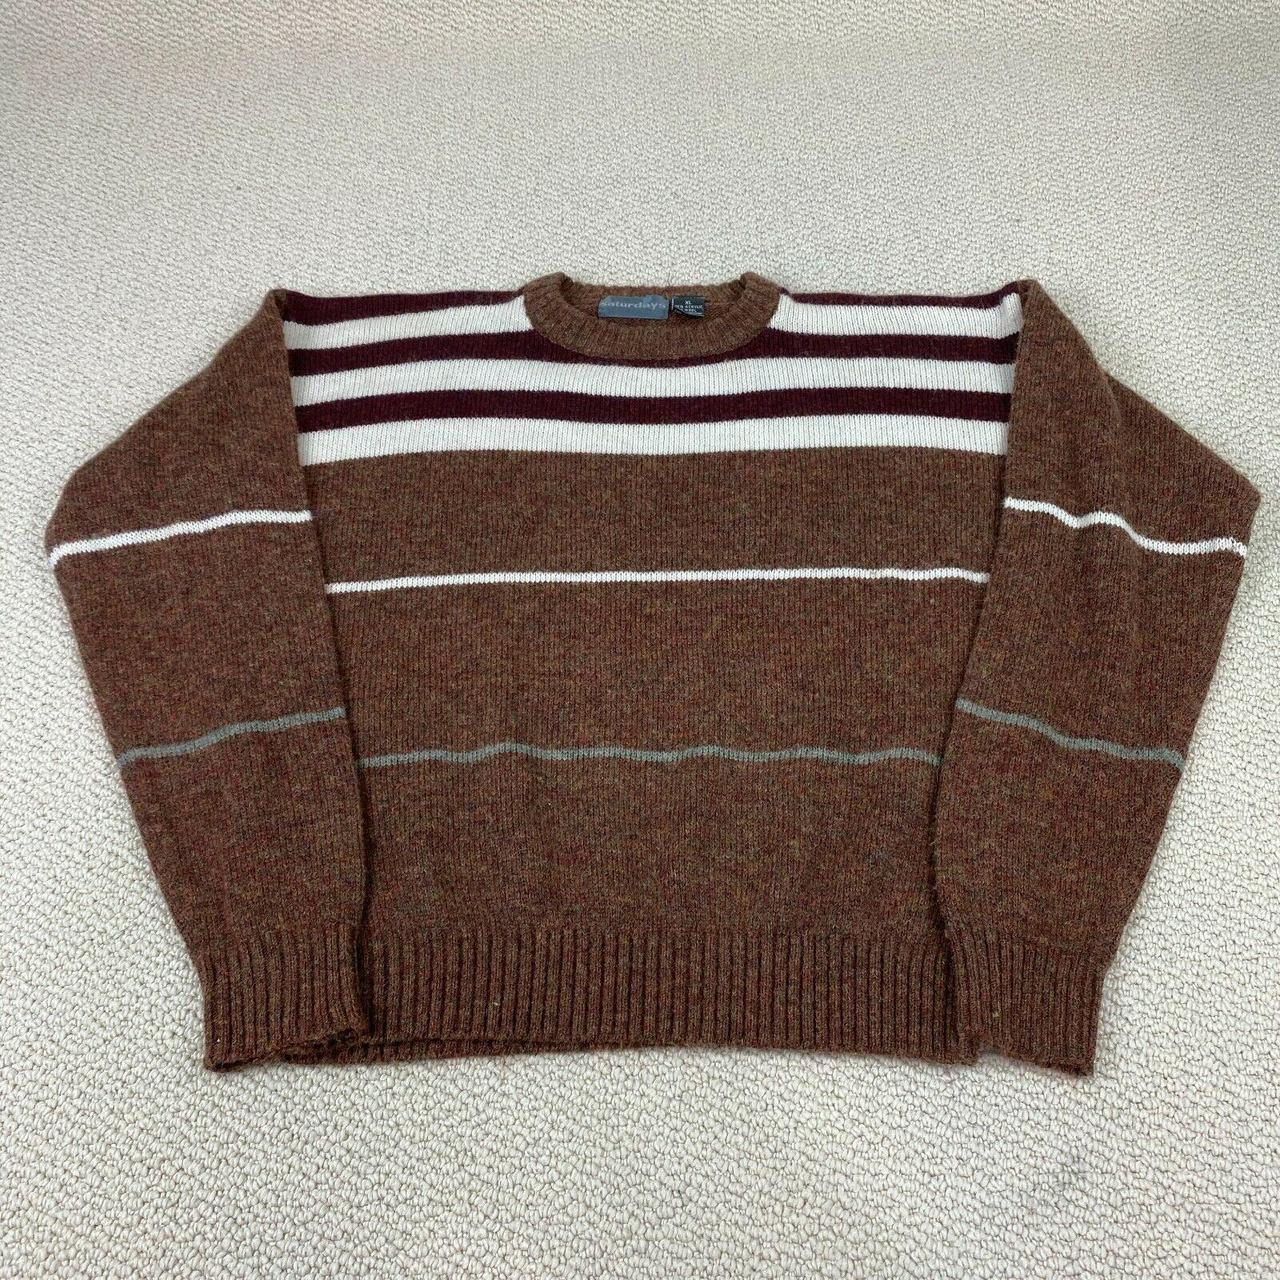 Product Image 1 - Vintage Saturdays Mens Sweater Crew